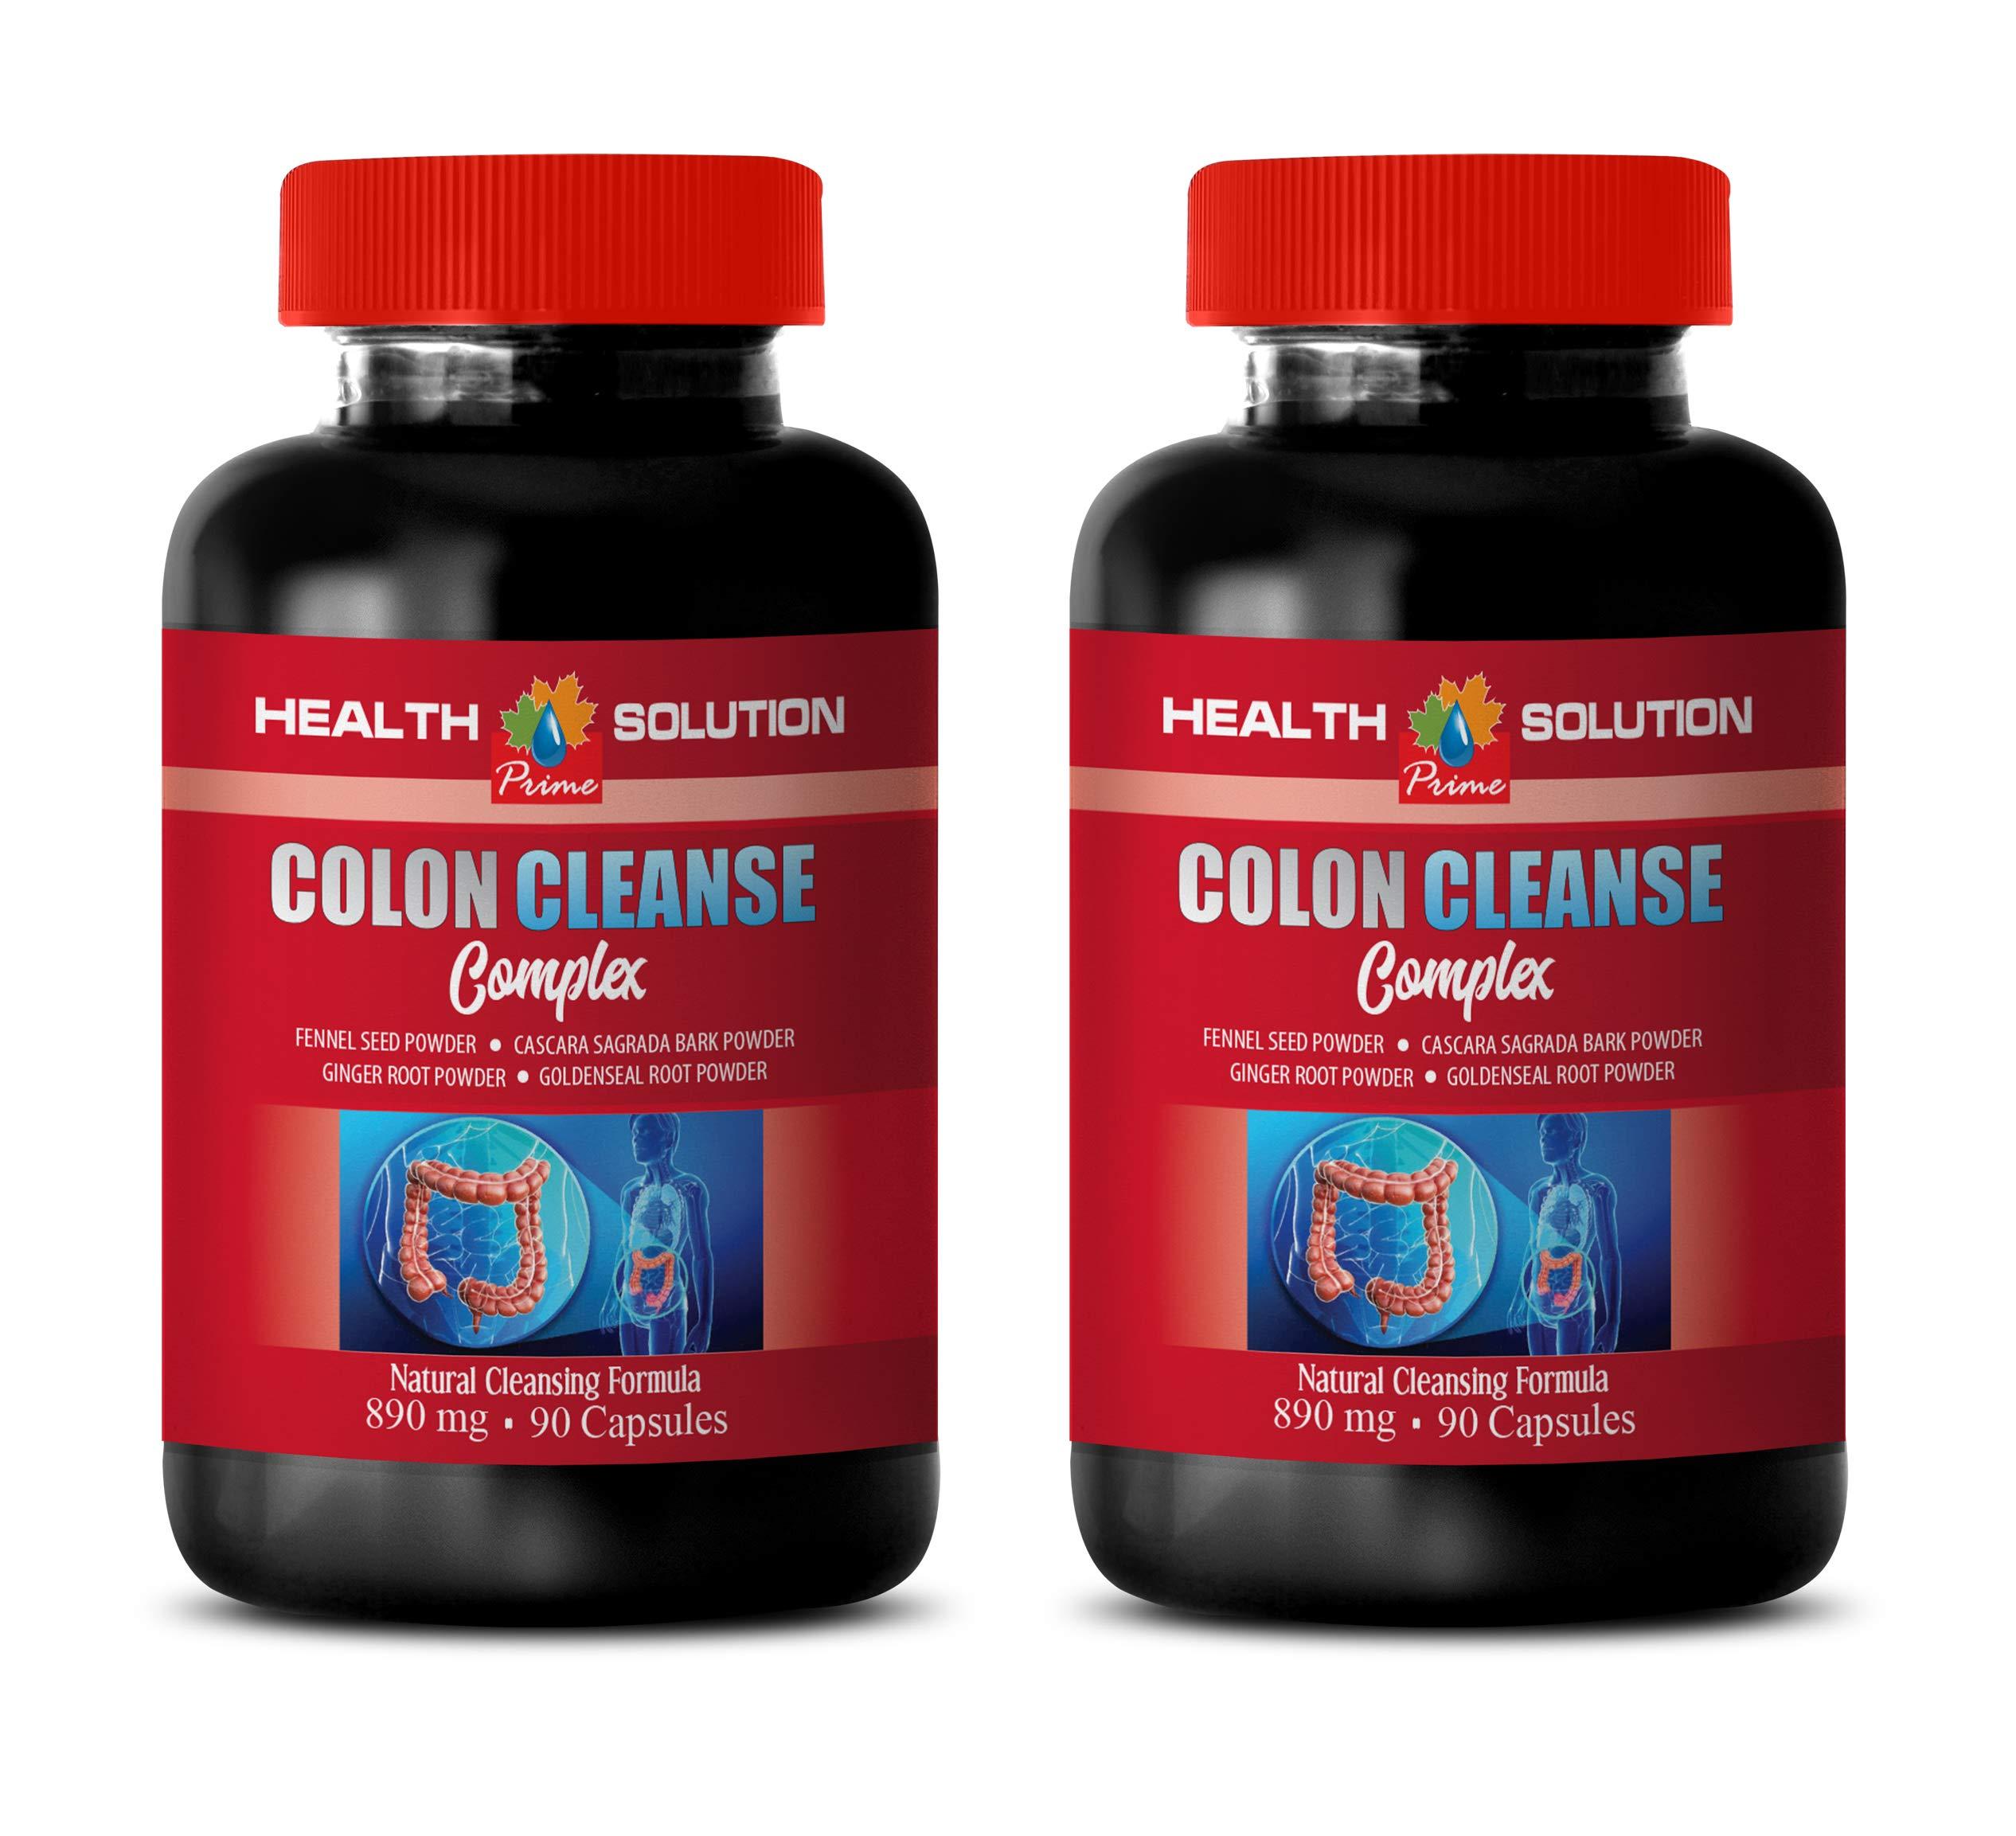 Colon Cleanse and Detox - Colon Cleanse Complex - psyllium Husk Sugar Free - 2 Bottles 180 Capsules